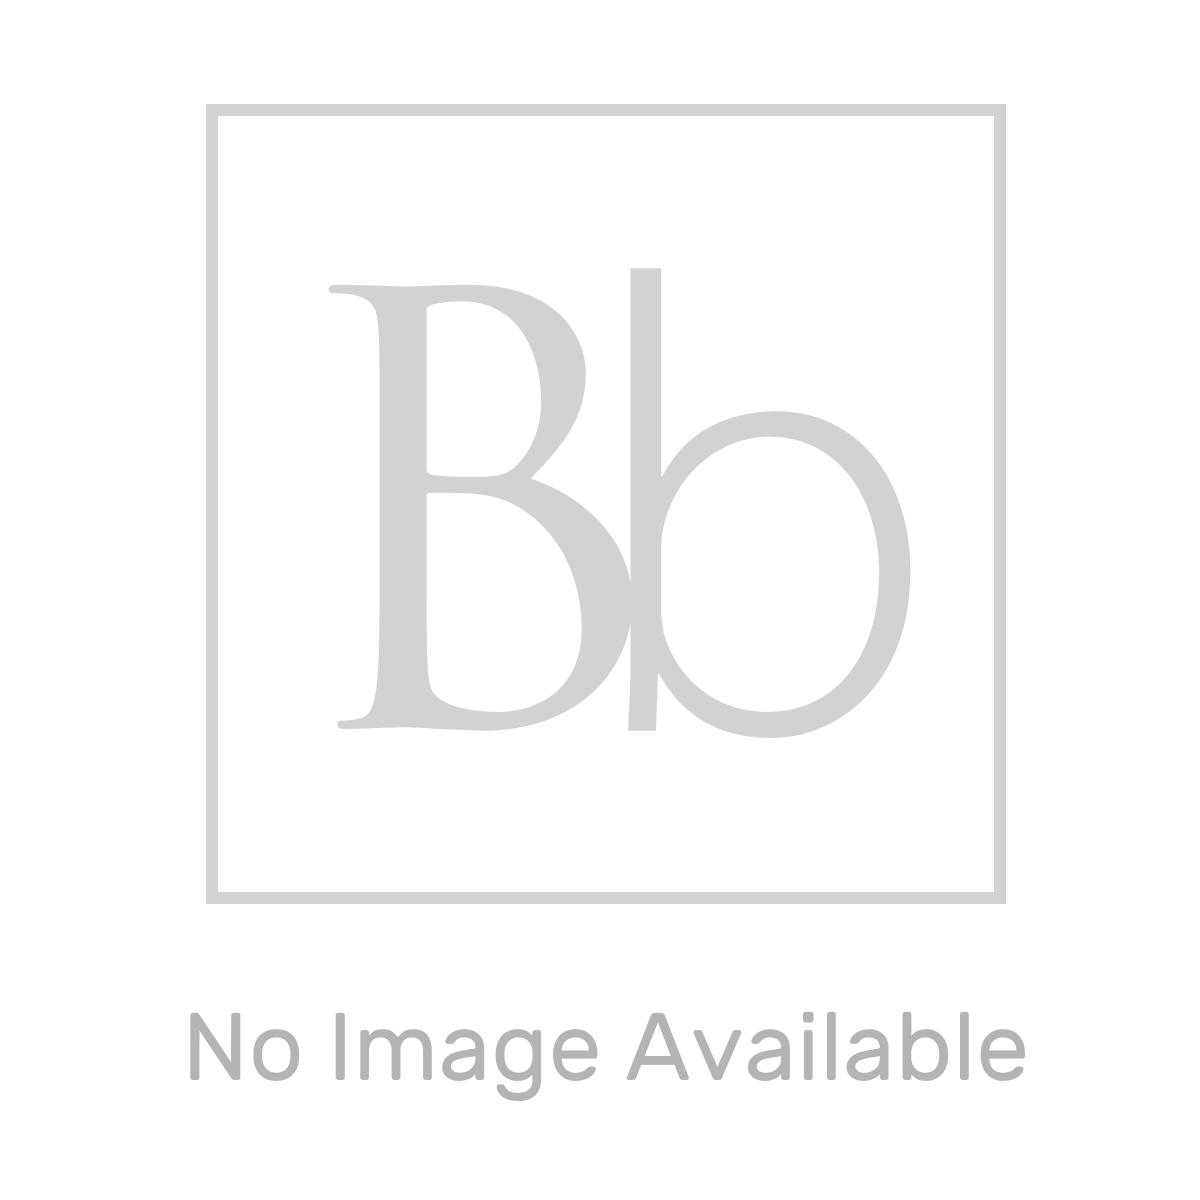 Elation Combination P Shape Bodega Grey Furniture Pack 1010mm Dimensions